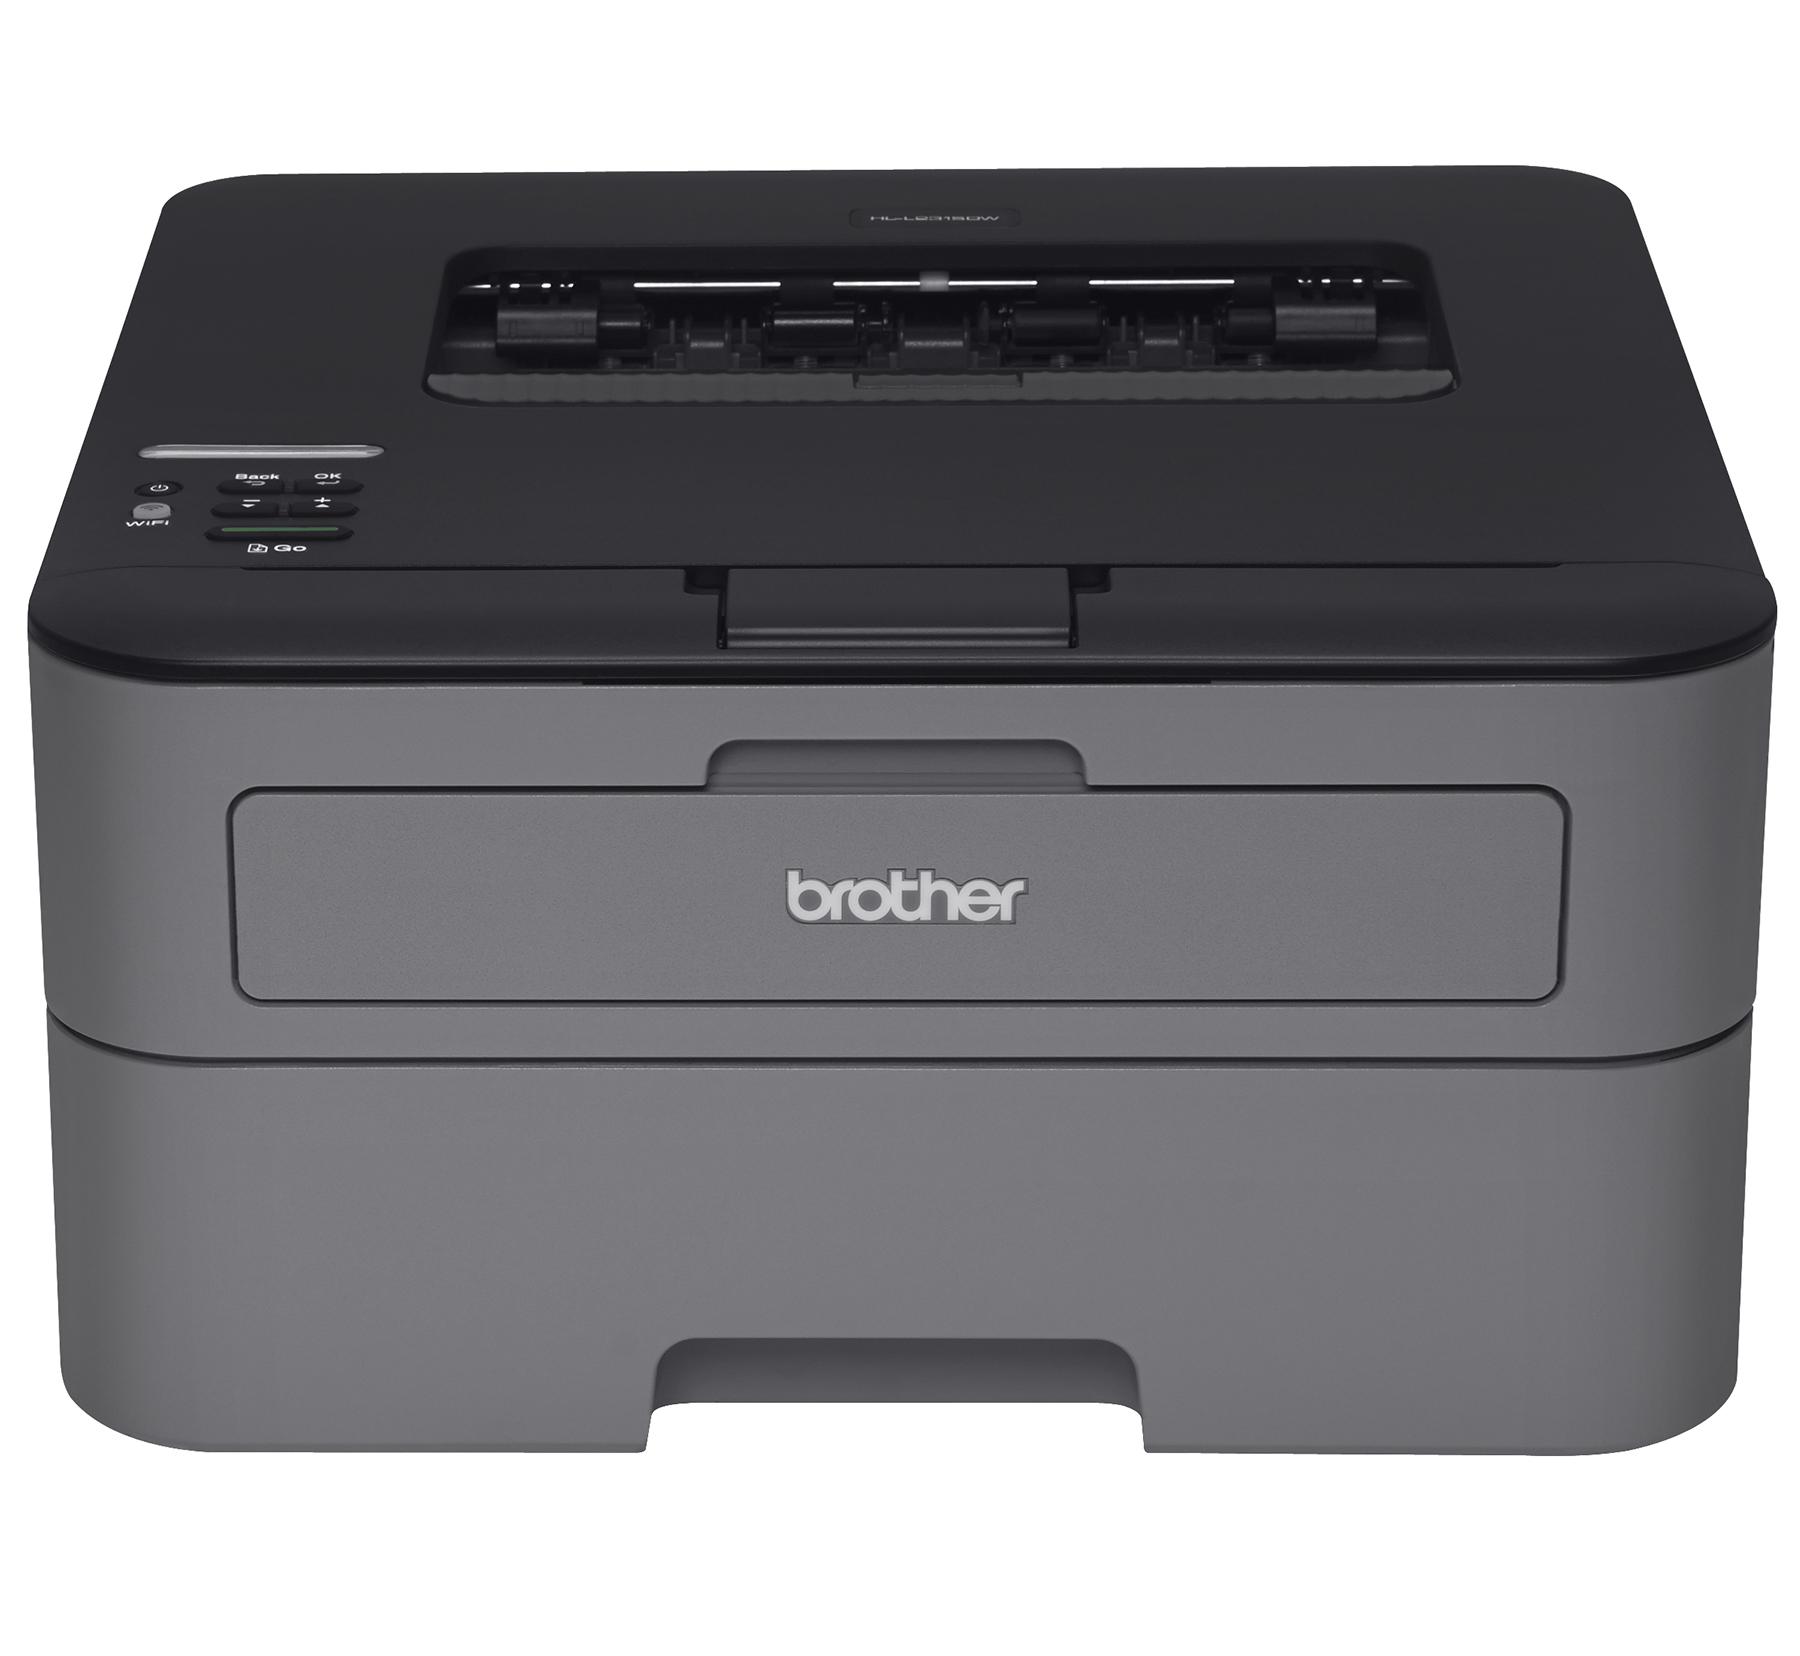 Brother Printer $69.99